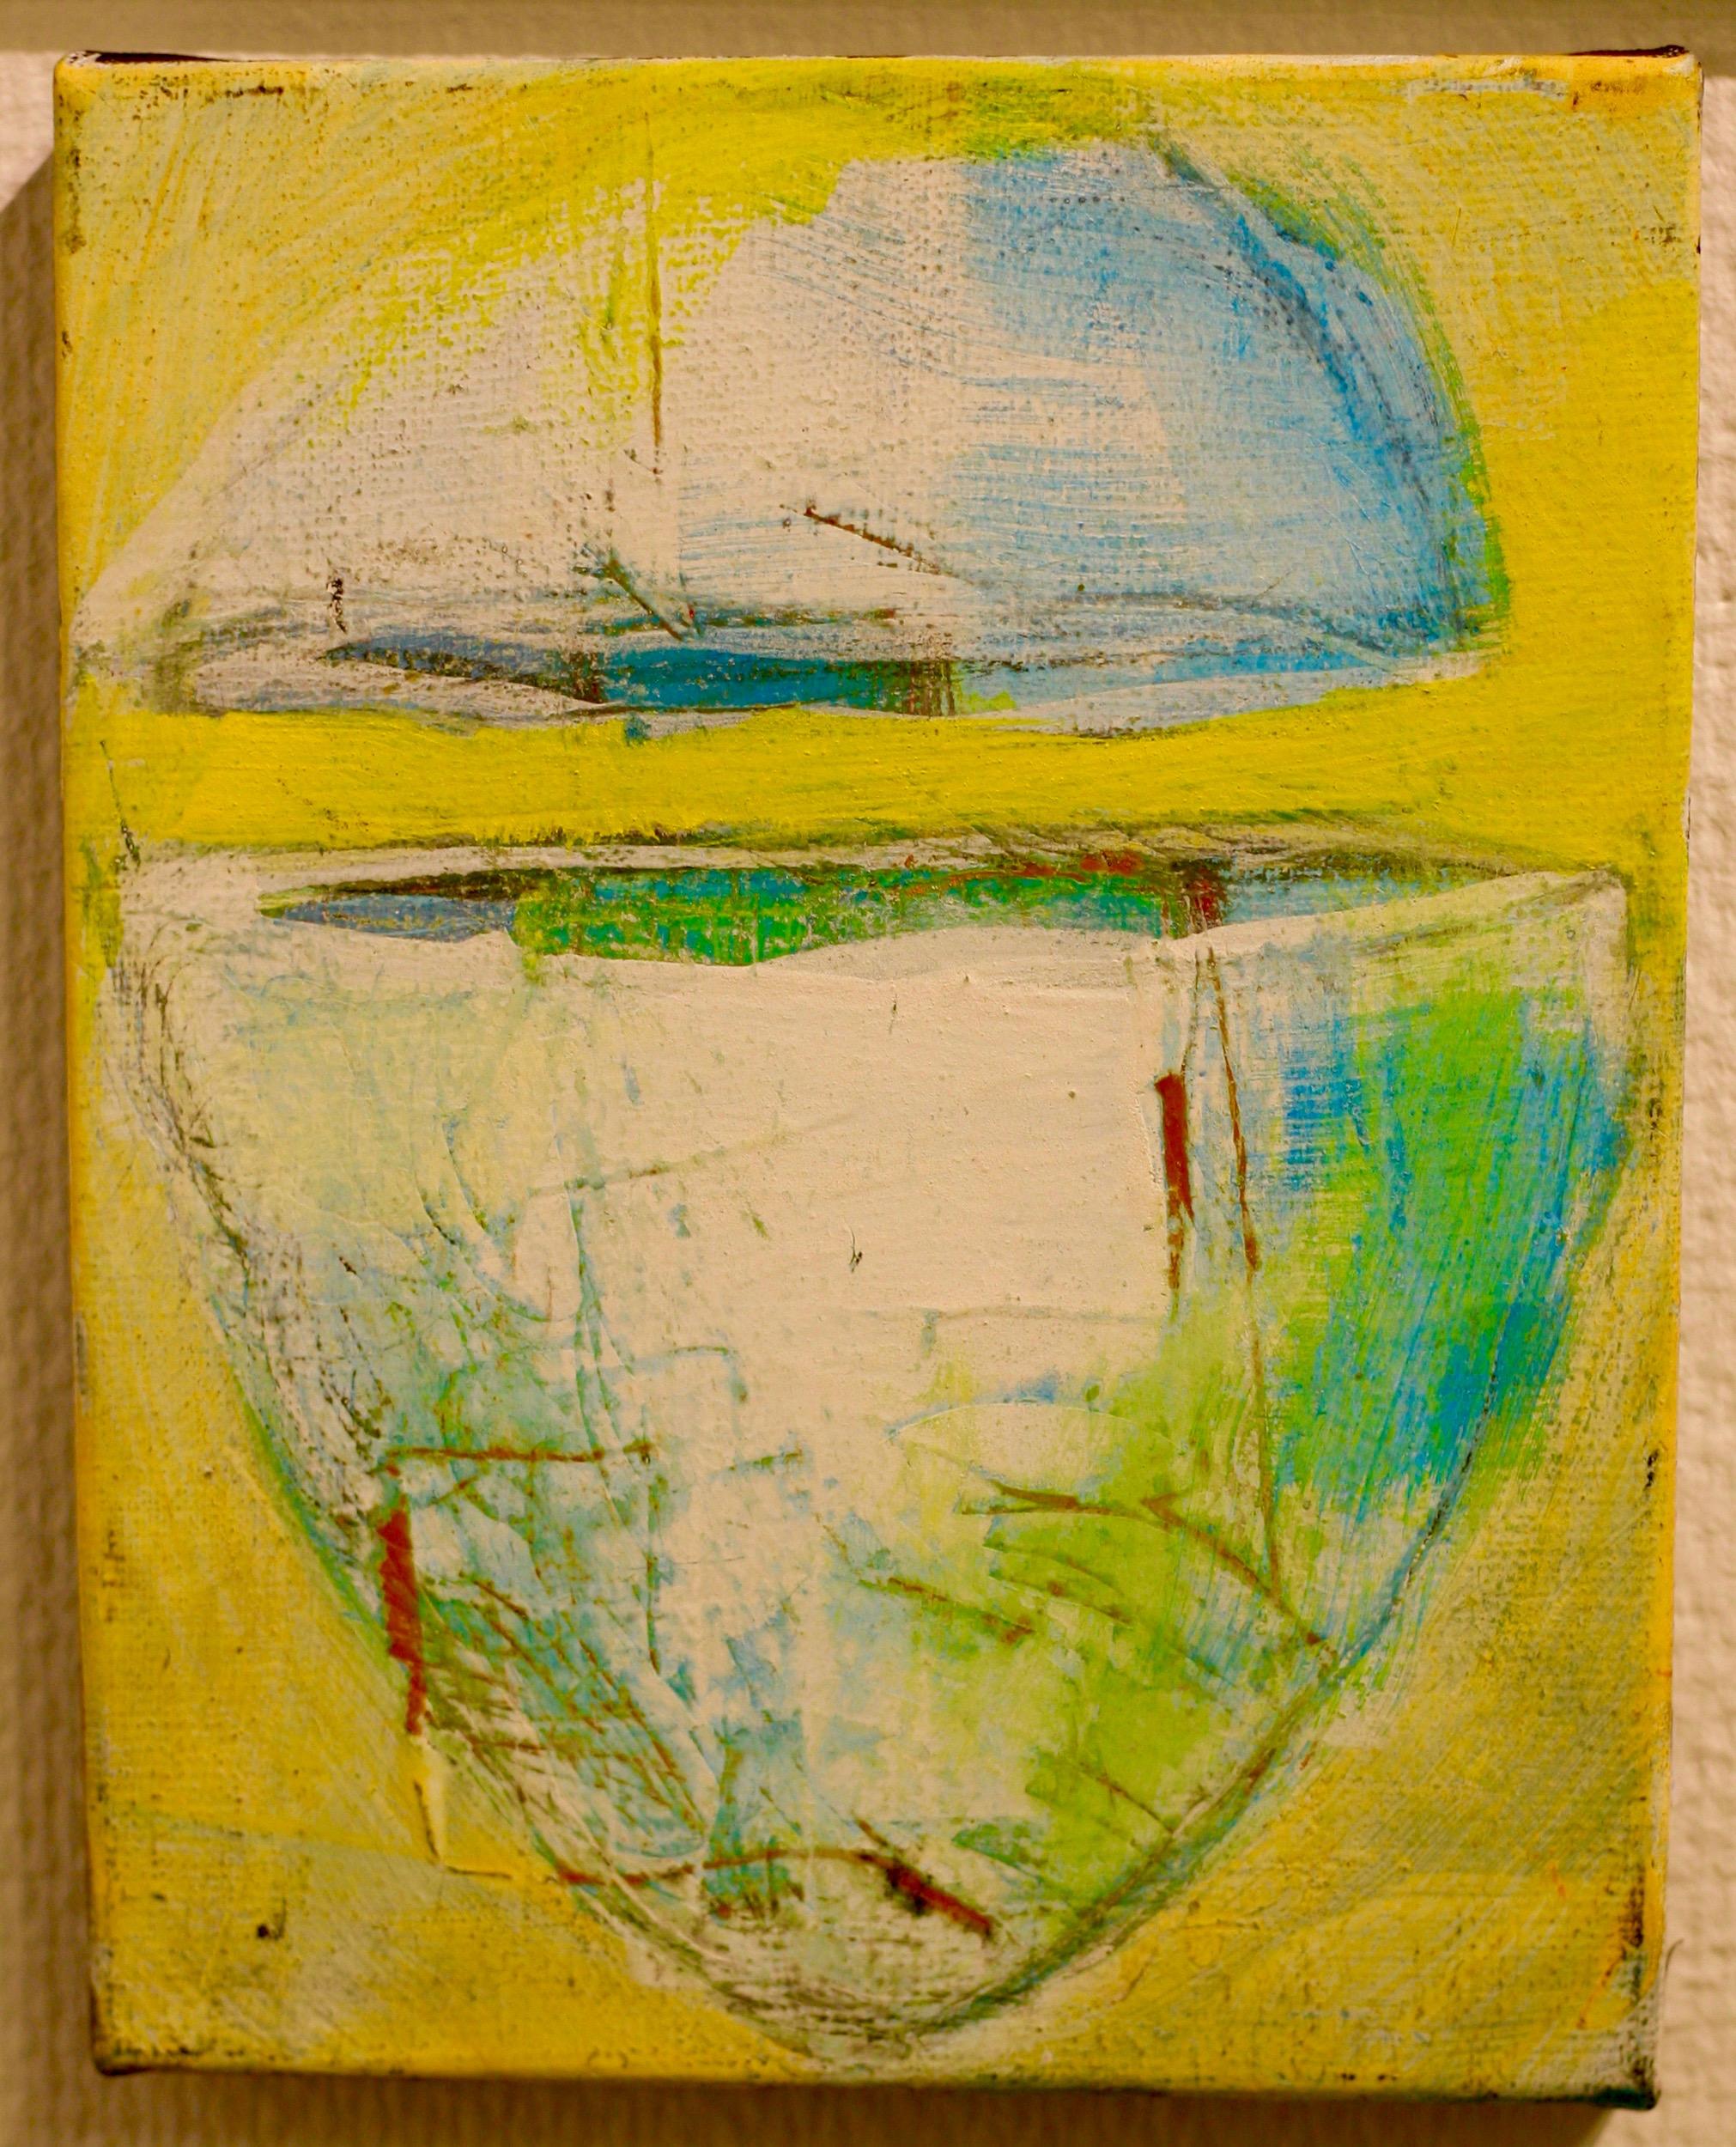 Inga Björstedt - The Egg (Ägget) - oil tempera painting